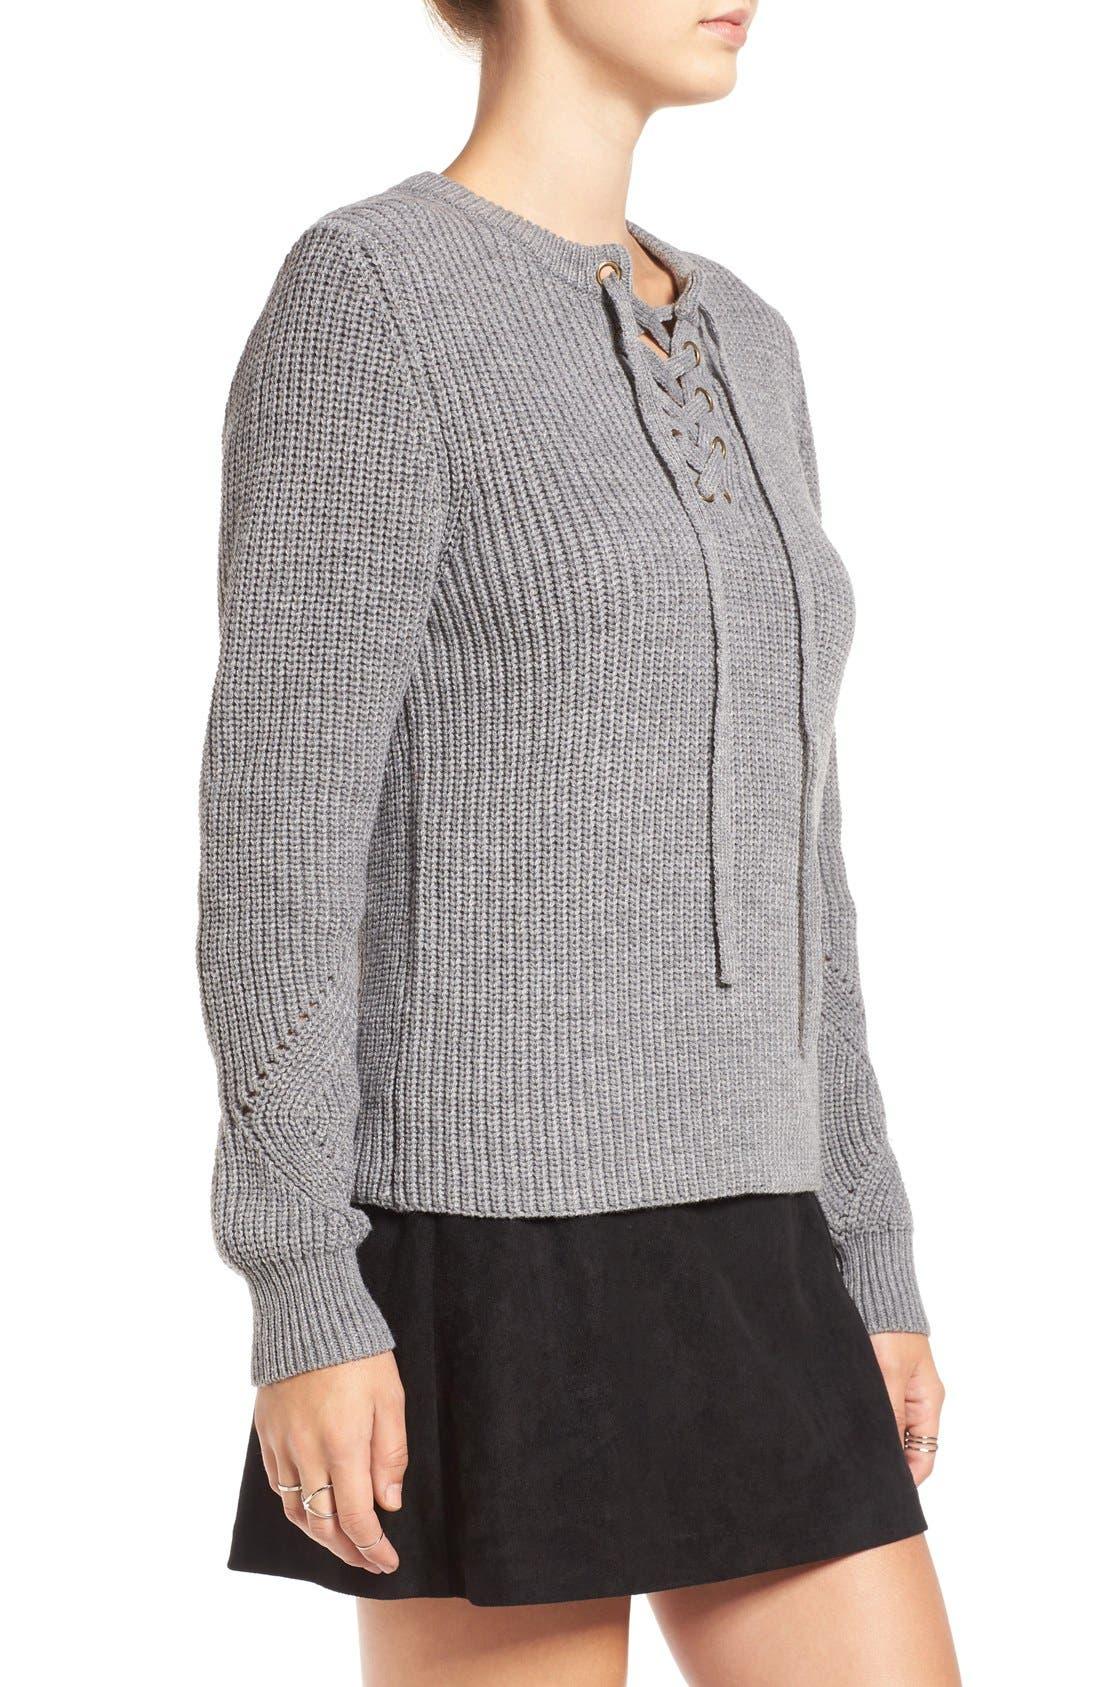 Alternate Image 3  - Elodie Rib Knit Lace-Up Sweater